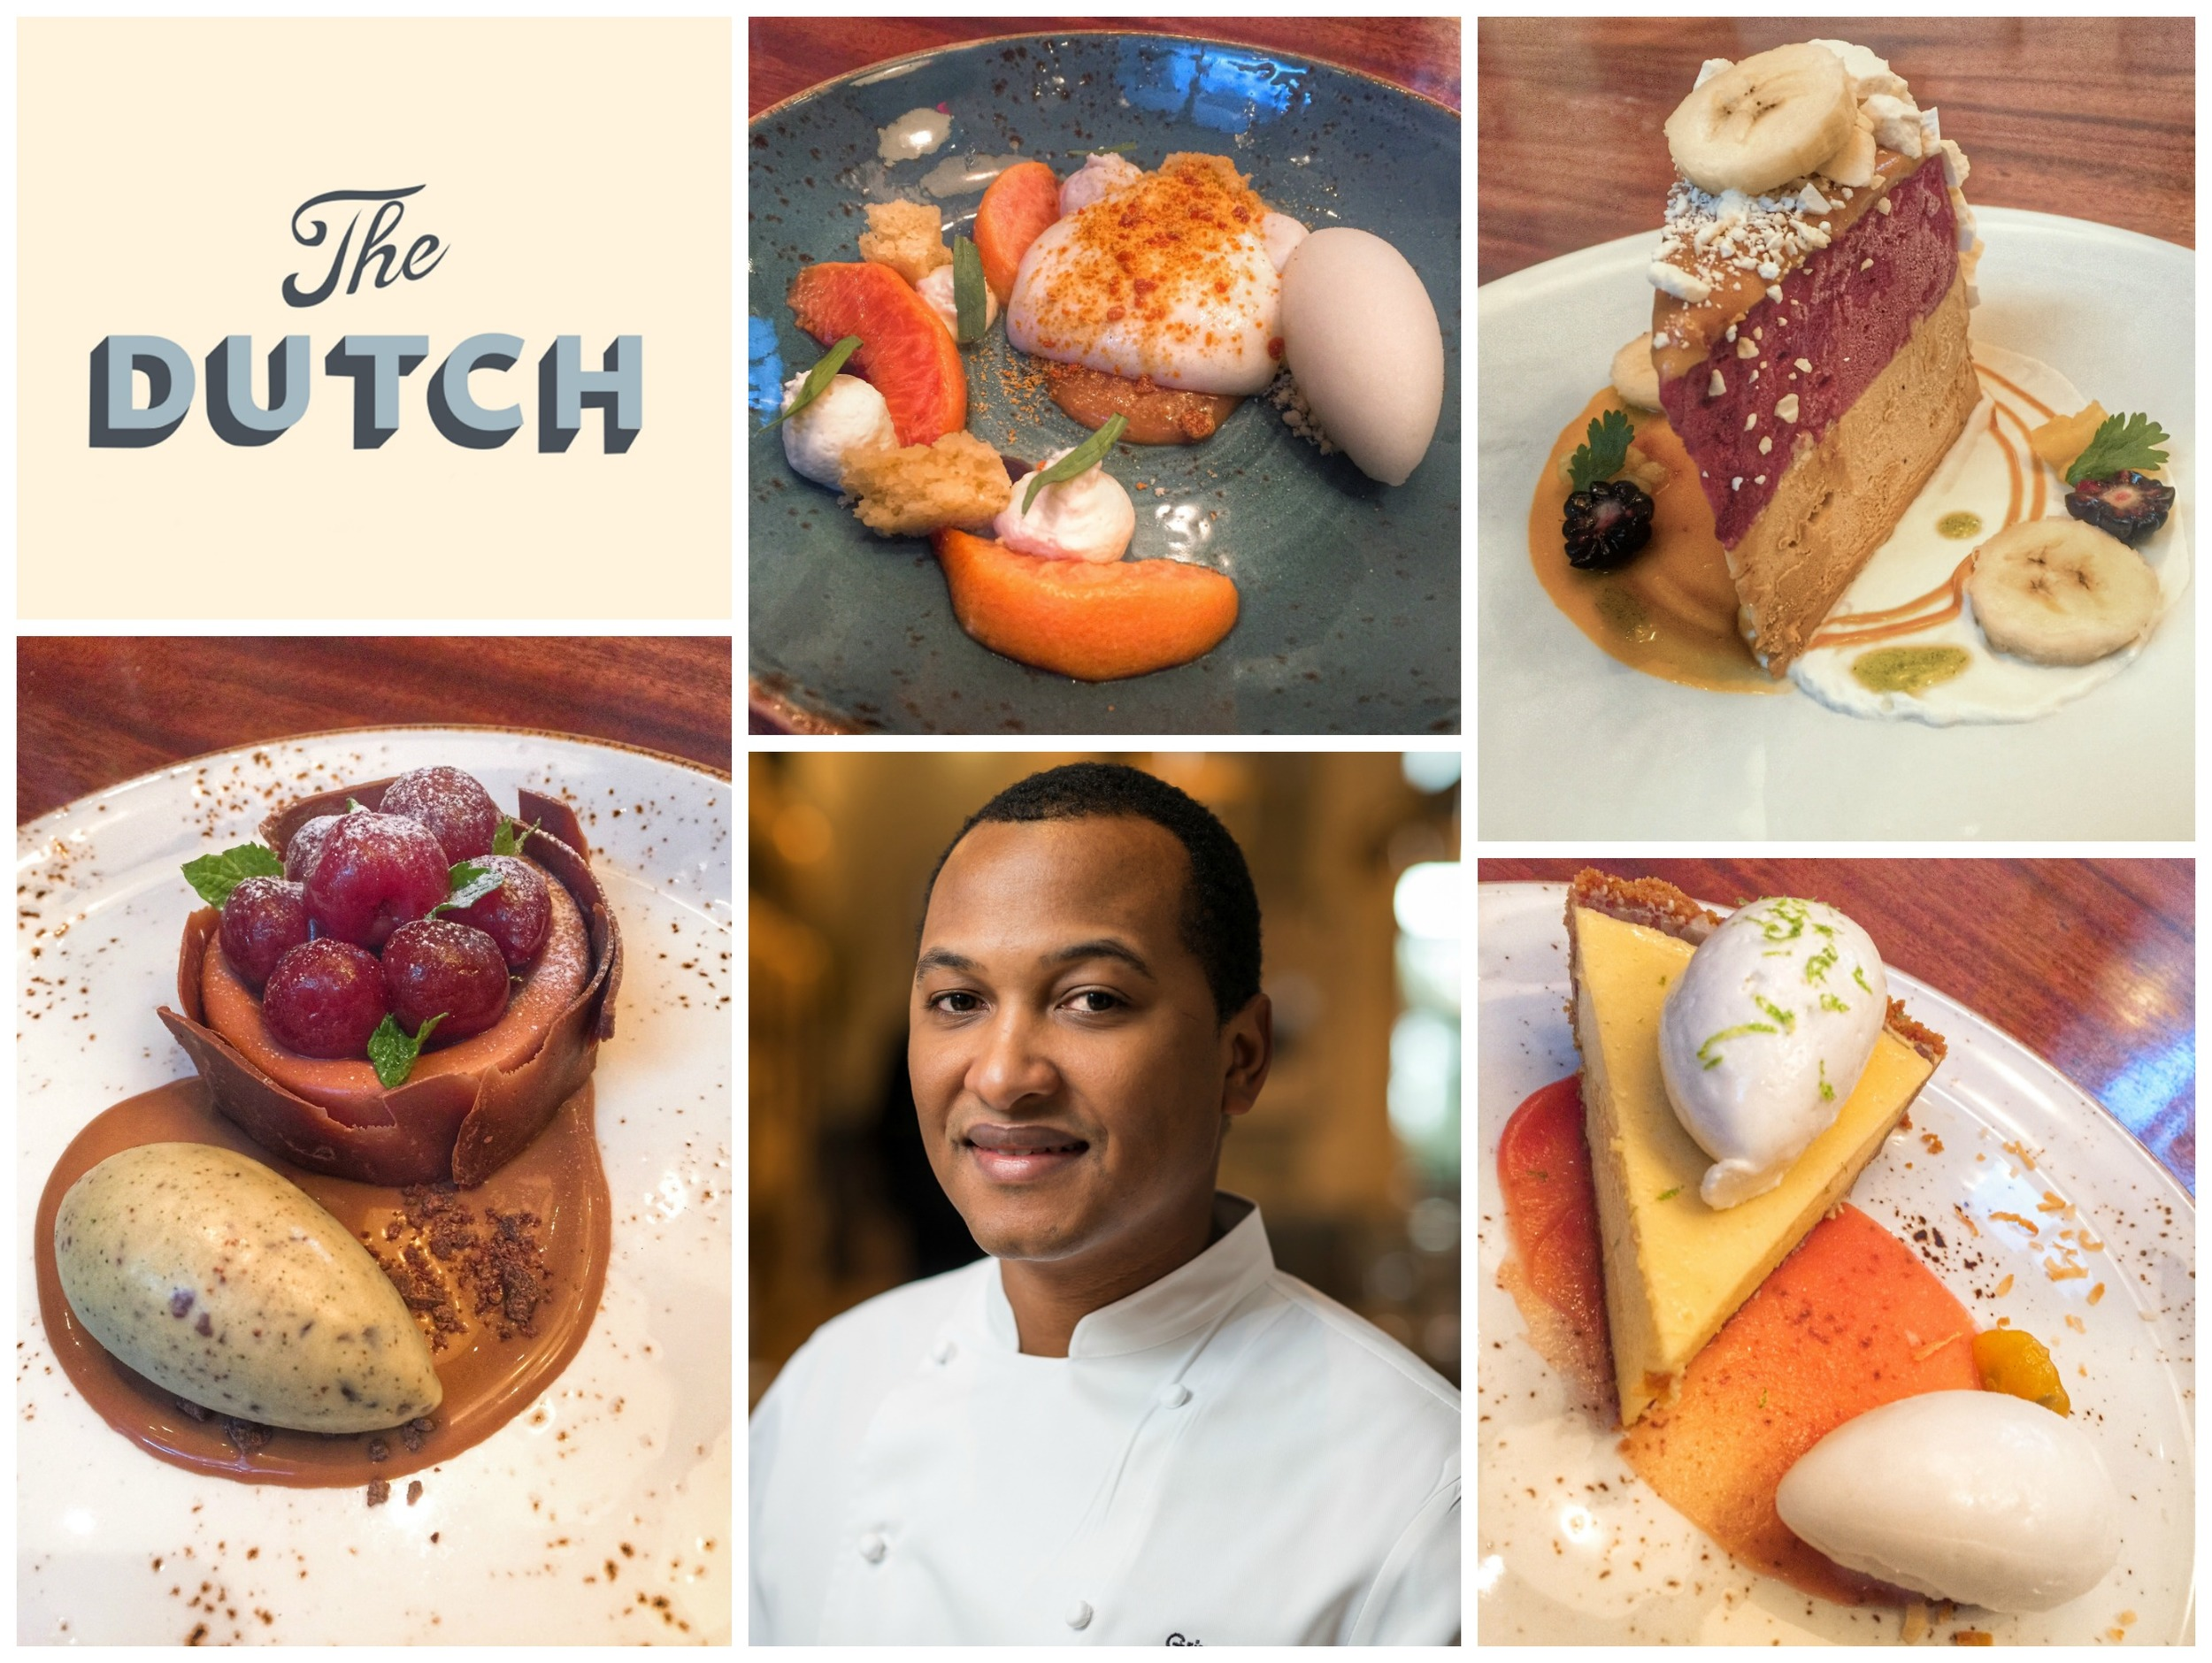 Dessert and Pastry Chef Josh Gripper of The Dutch Miami